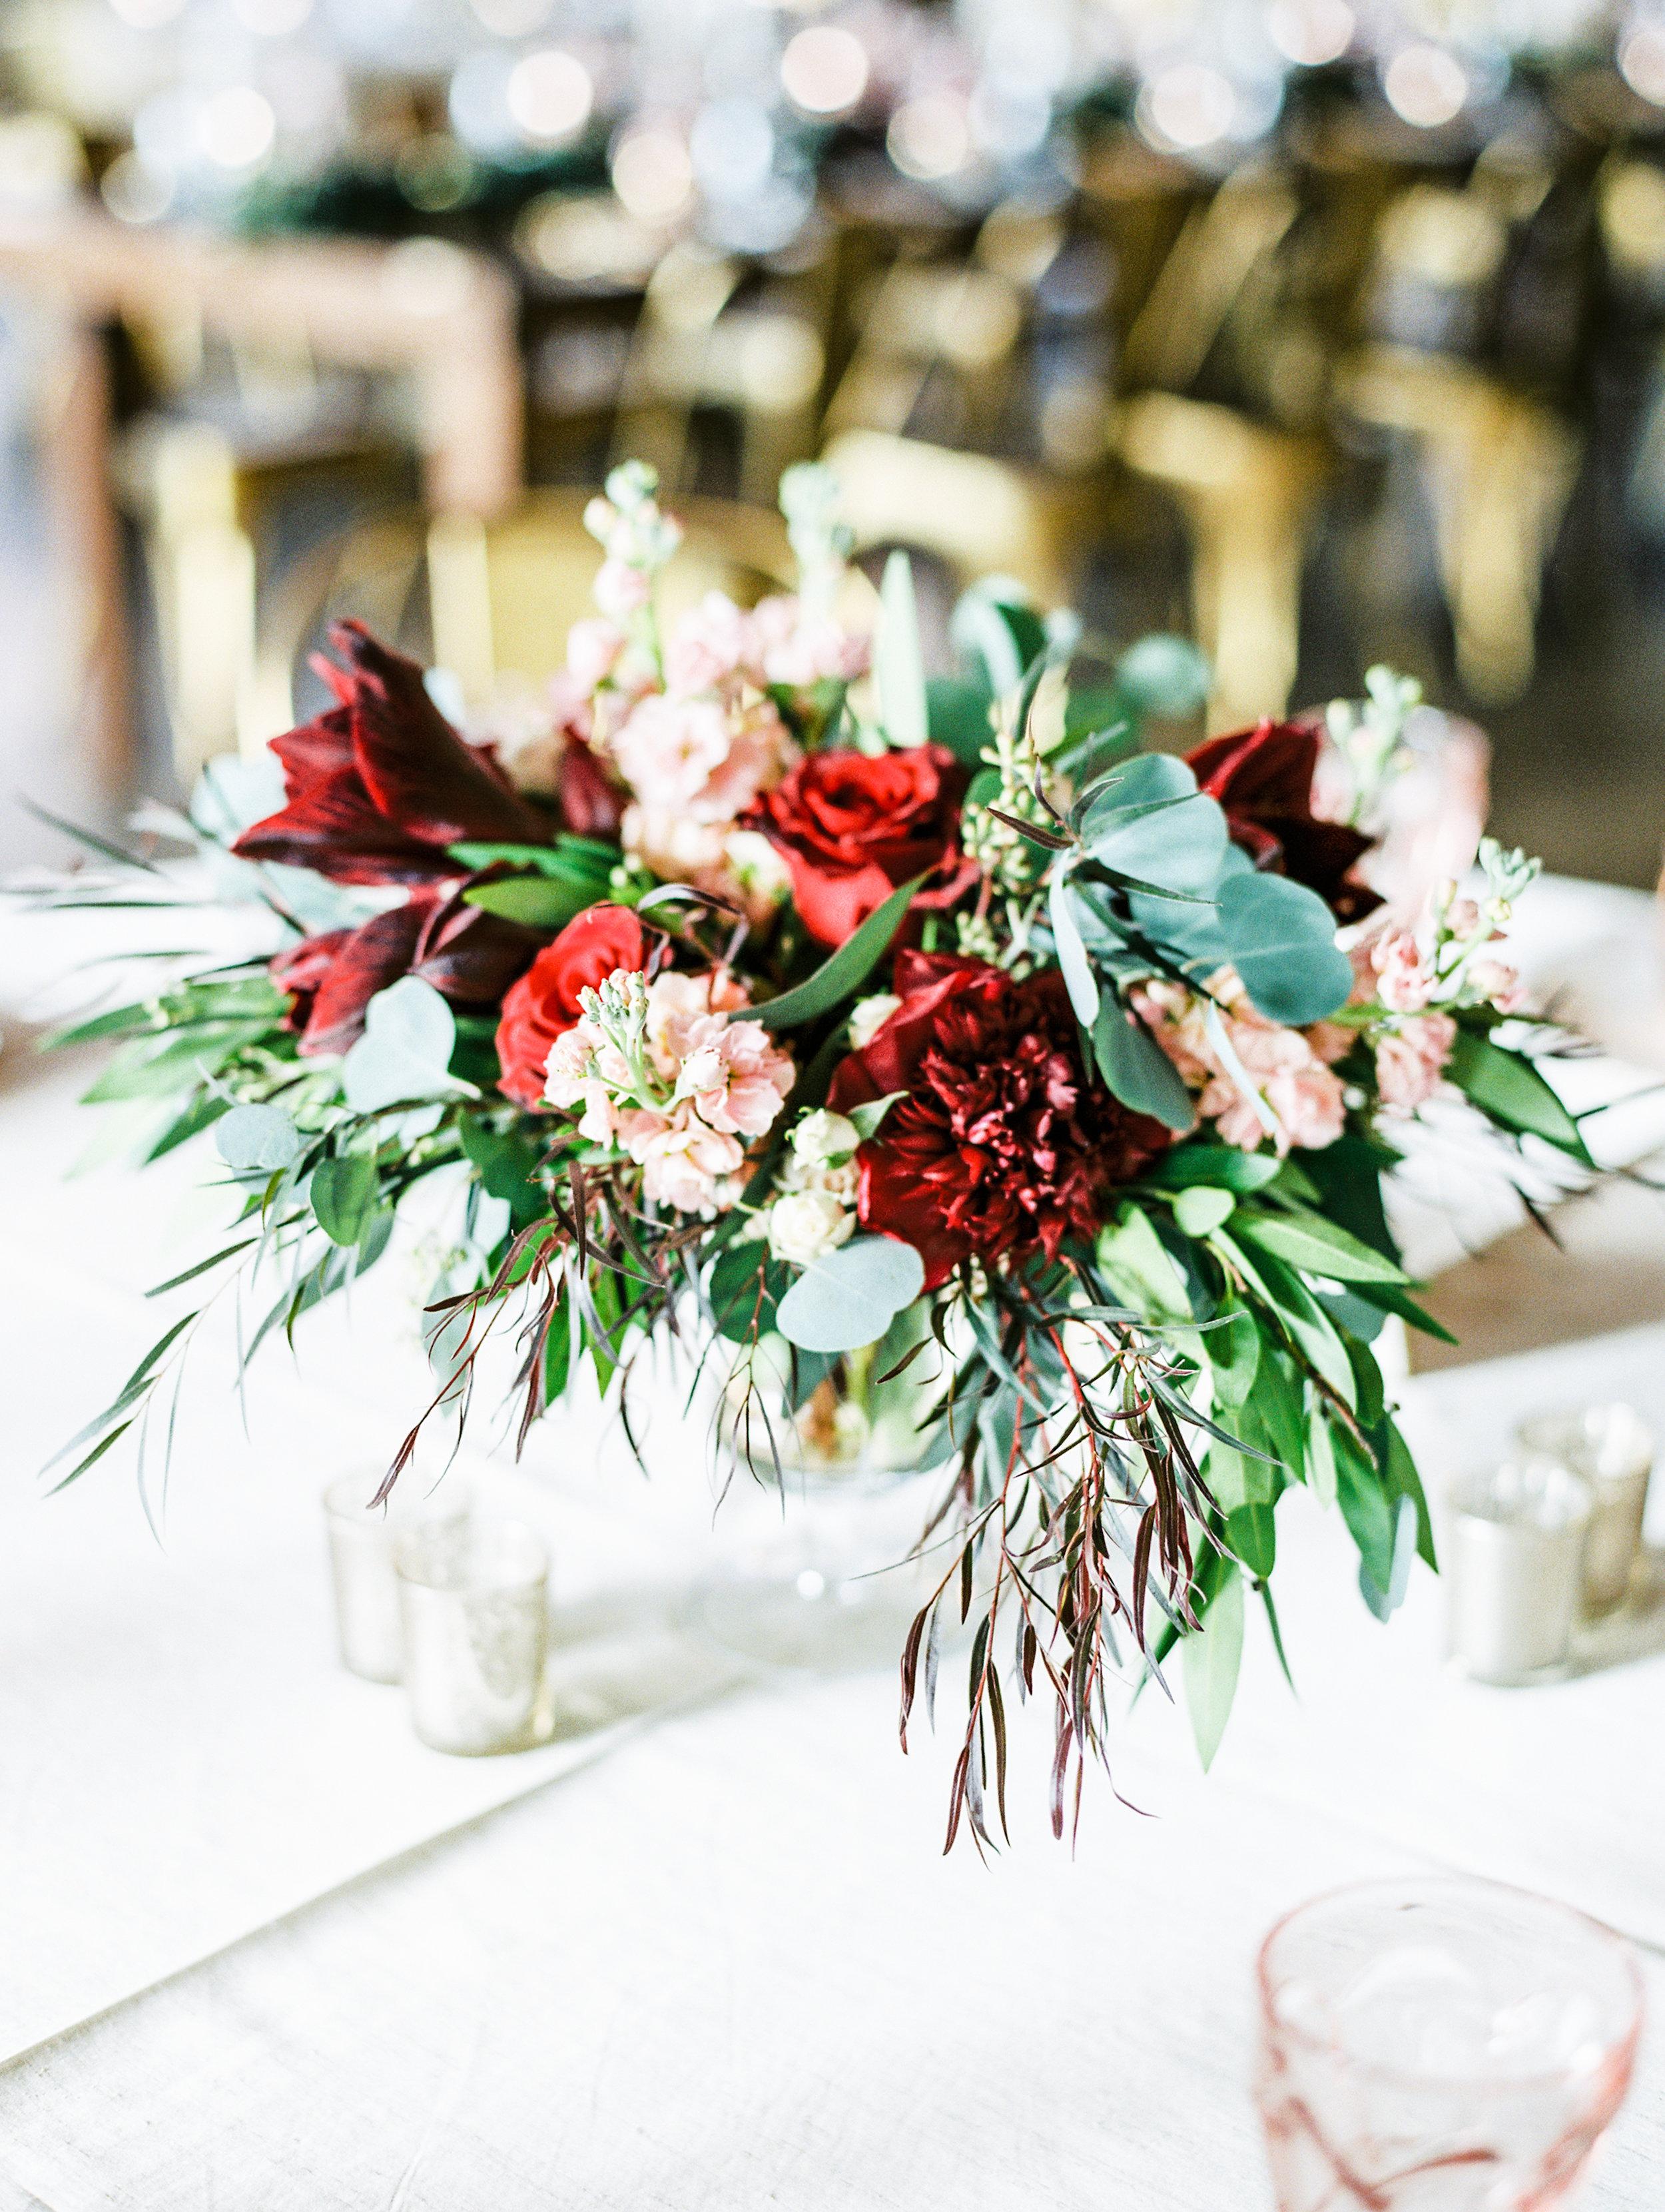 Vogelzang+Wedding+Reception+Details-114.jpg